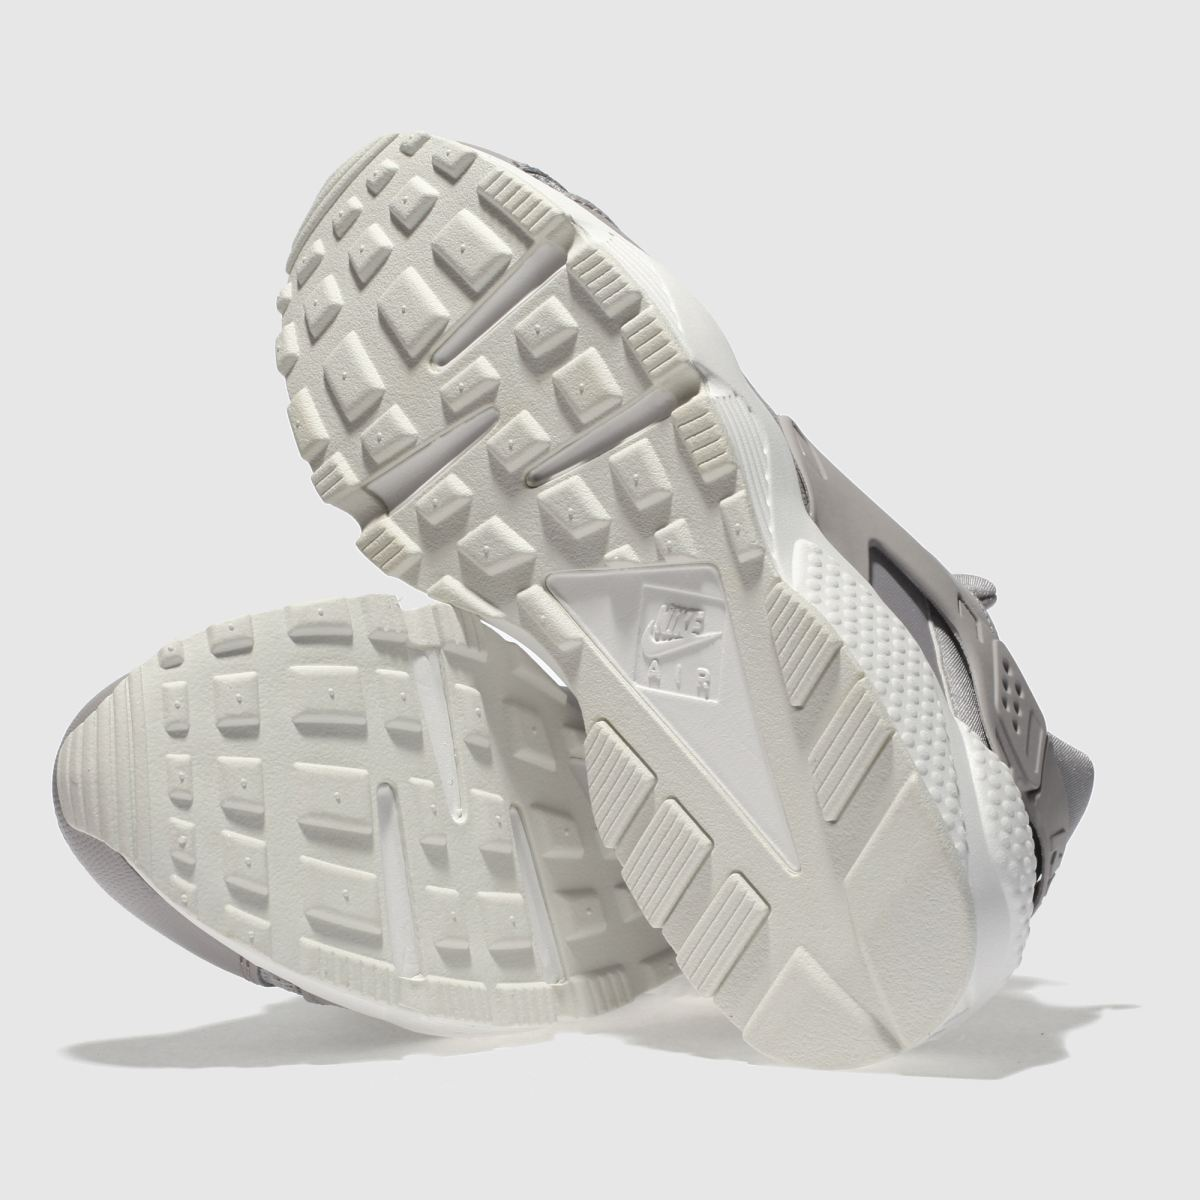 Damen Hellgrau nike   Huarache Run Se Sneaker   nike schuh Gute Qualität beliebte Schuhe 733ffe